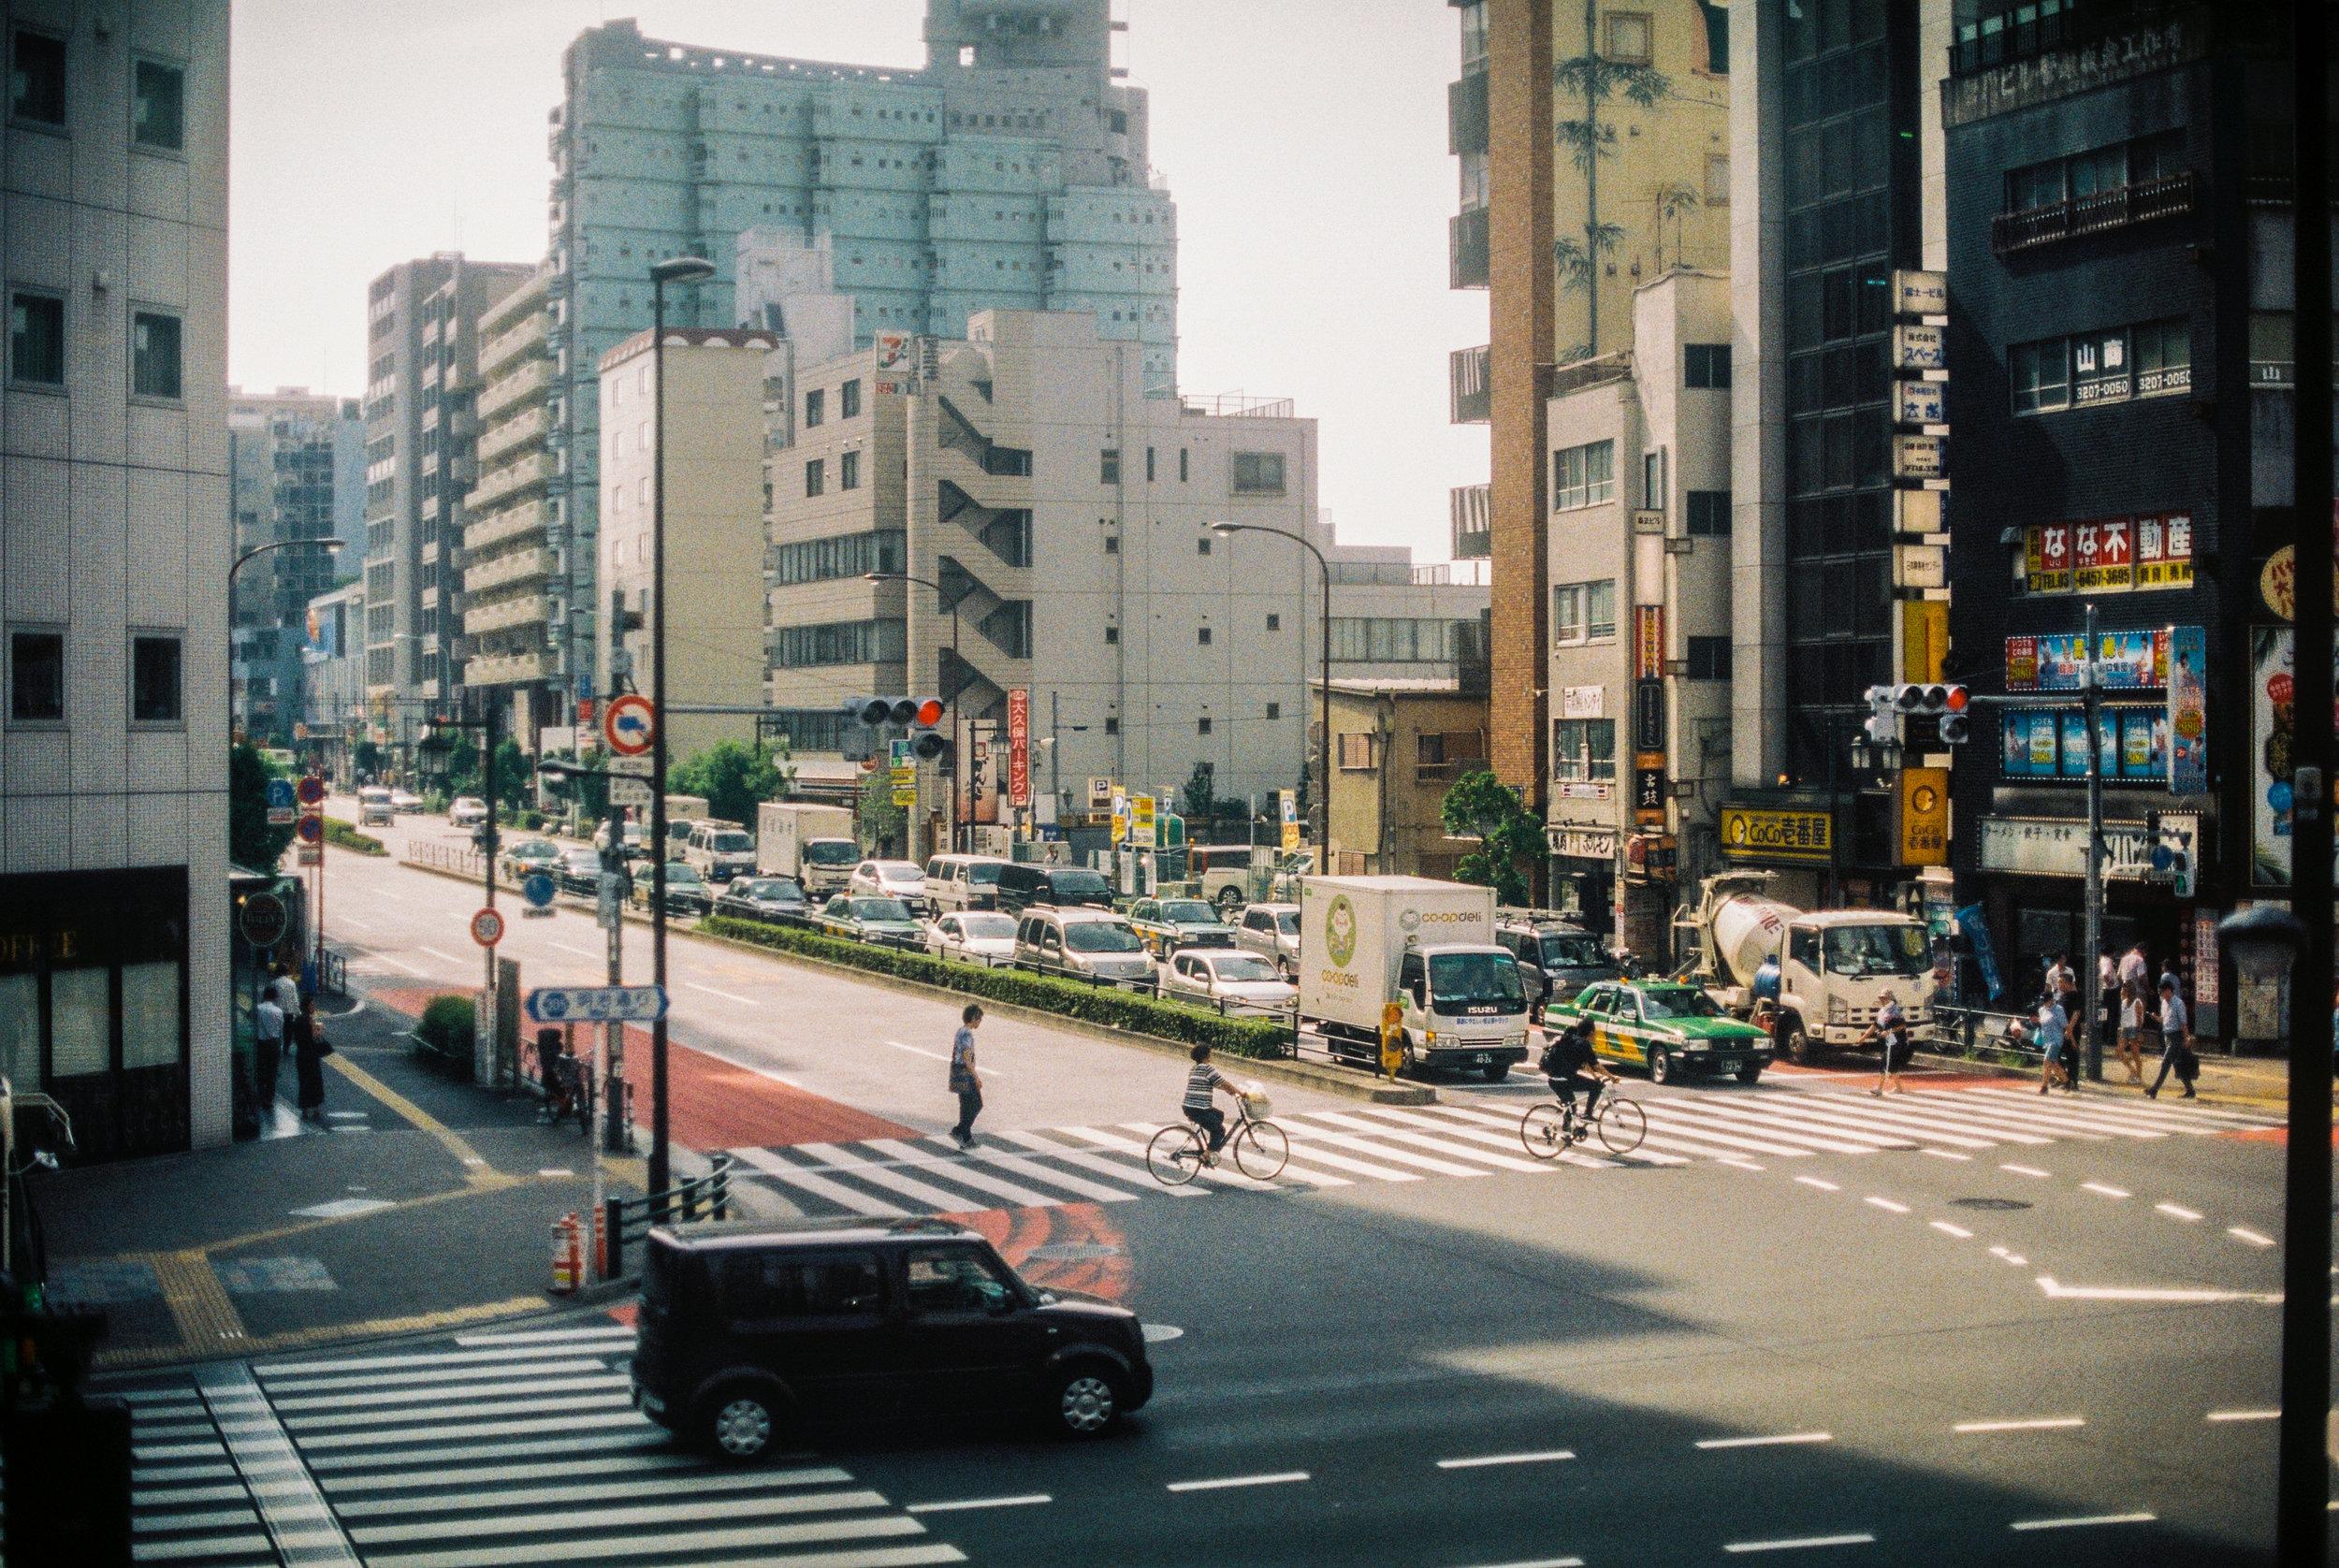 japan35mmfilm-benjaminandrew.jpg